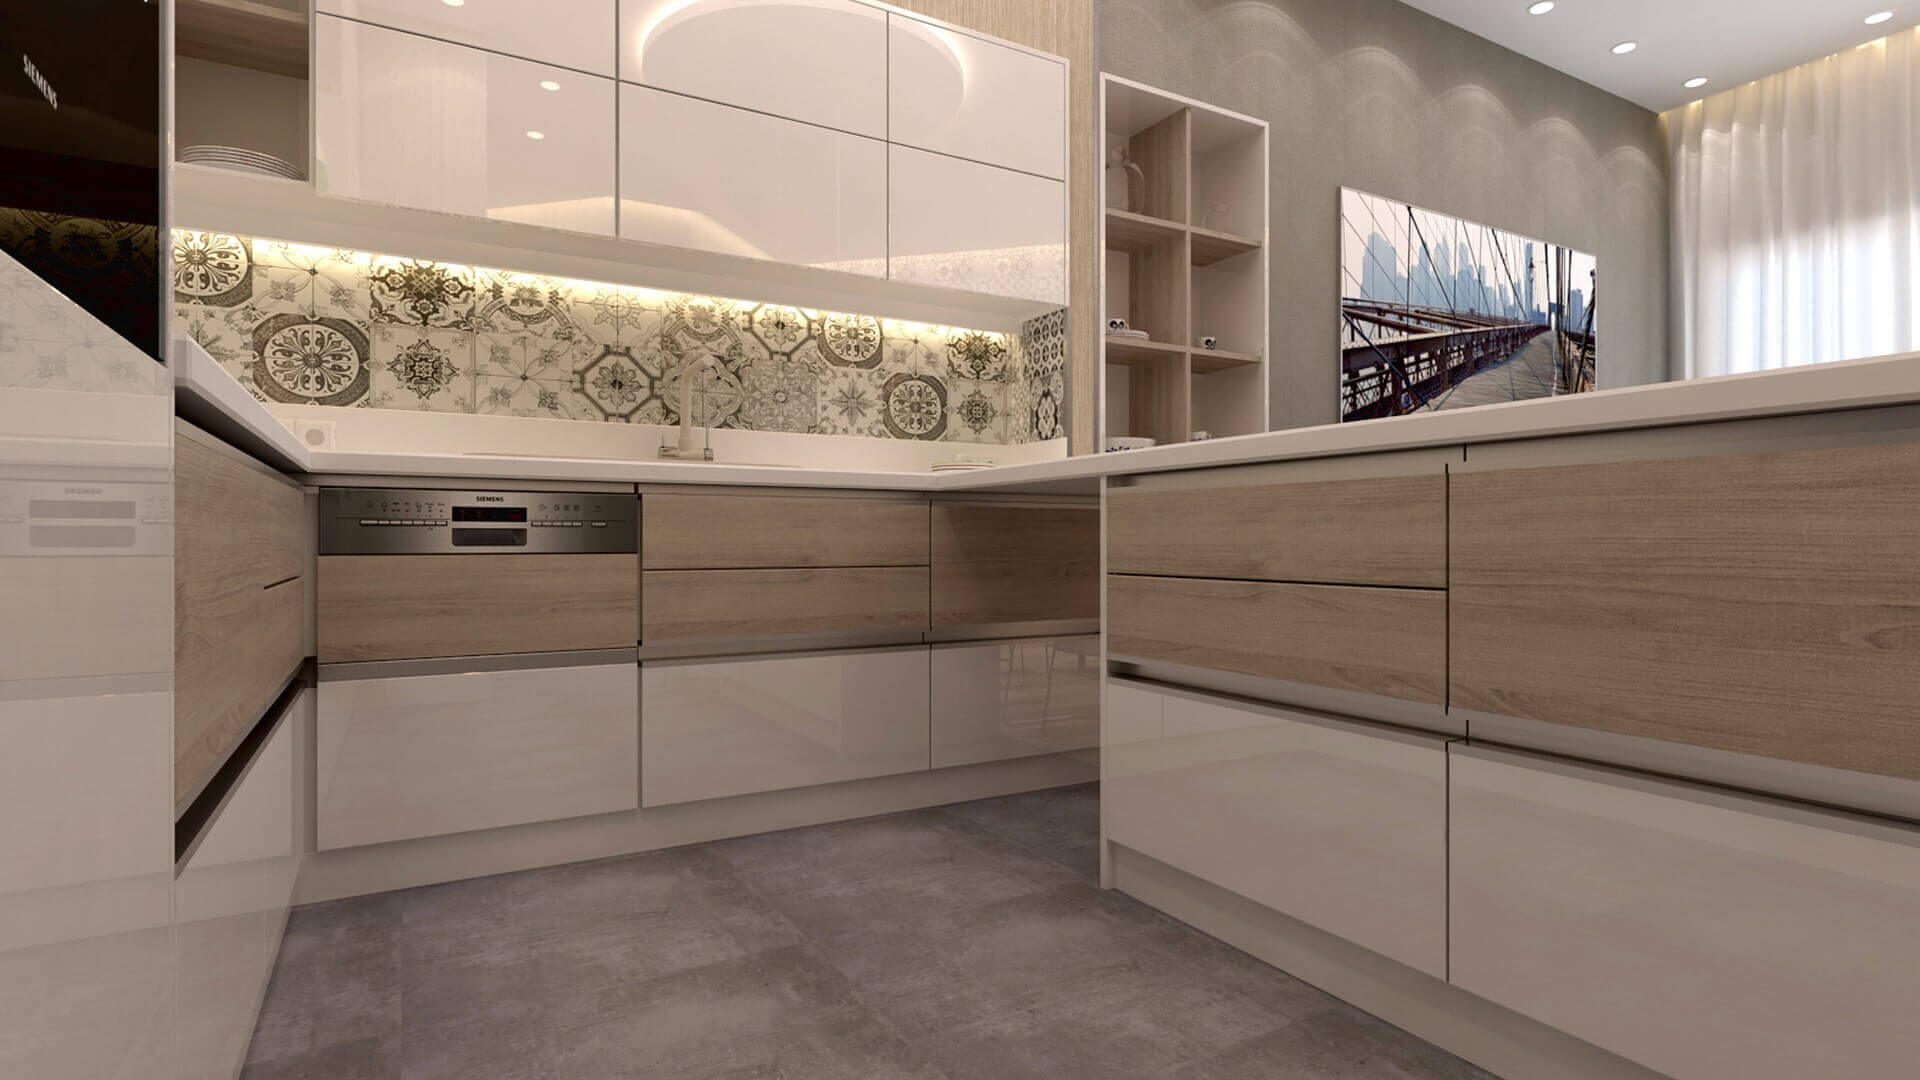 Sinpaş Altınoran 3197 D. Aslan Flat Residential